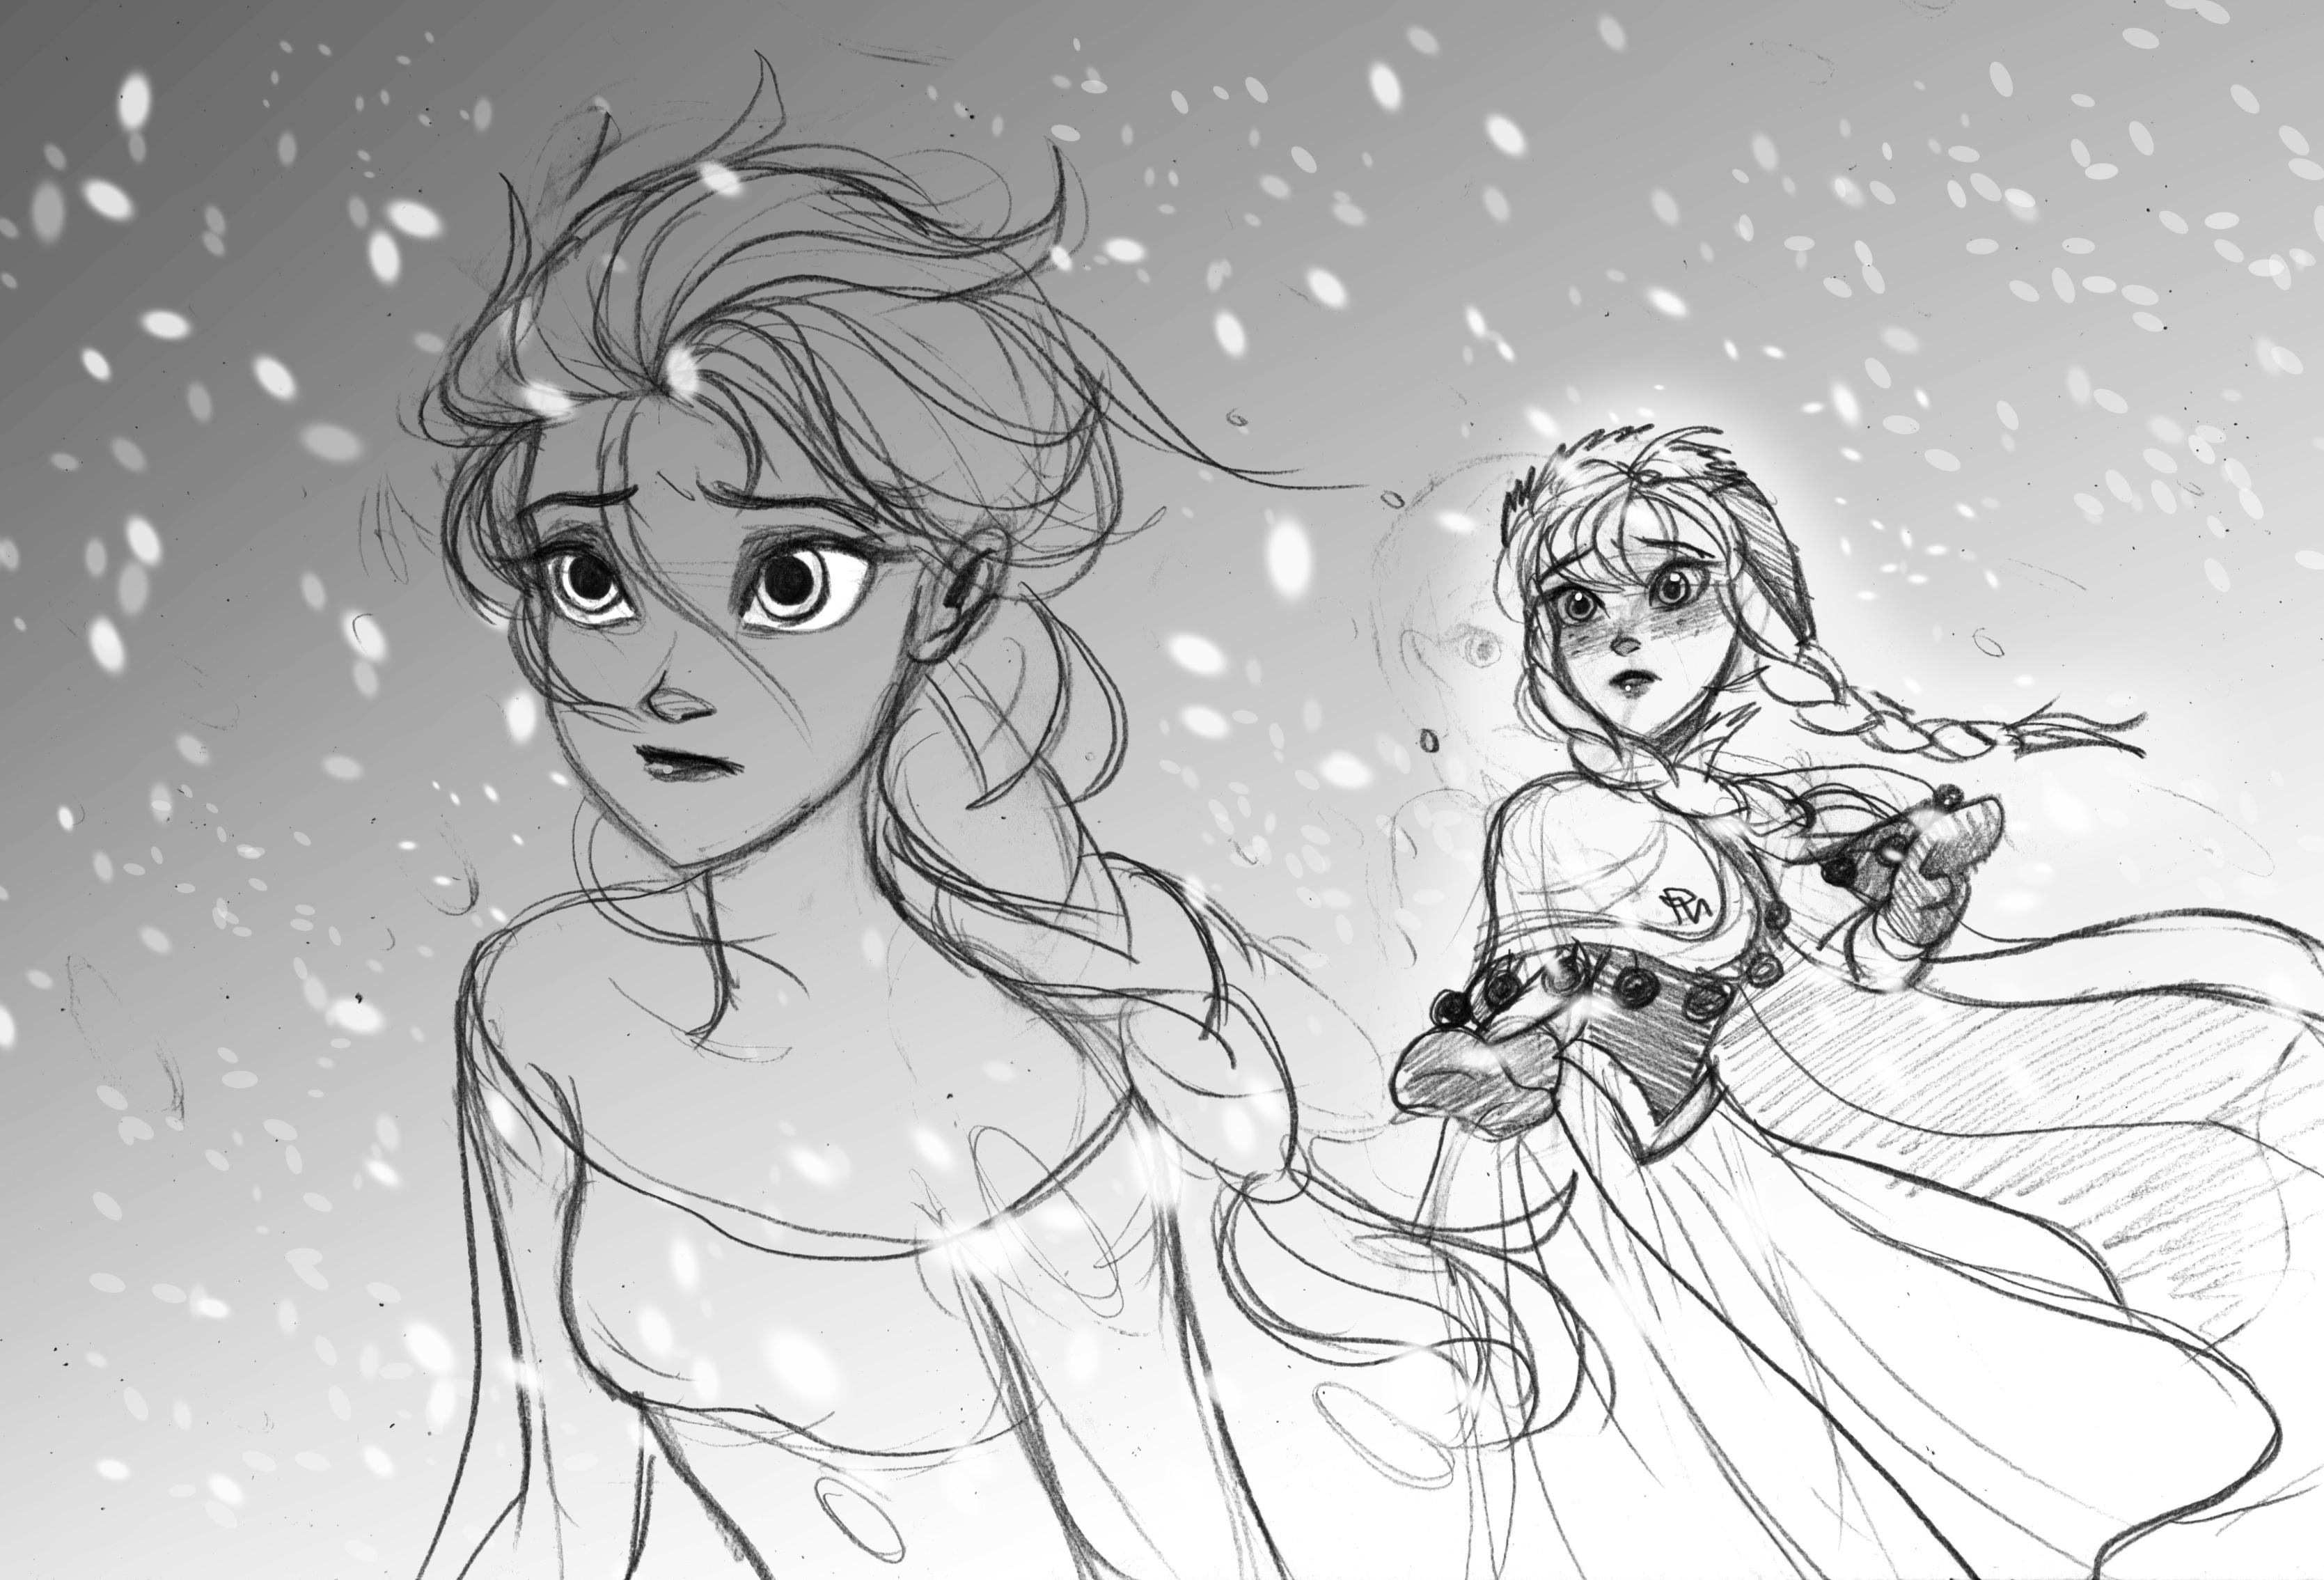 anna - 《冰雪奇缘》